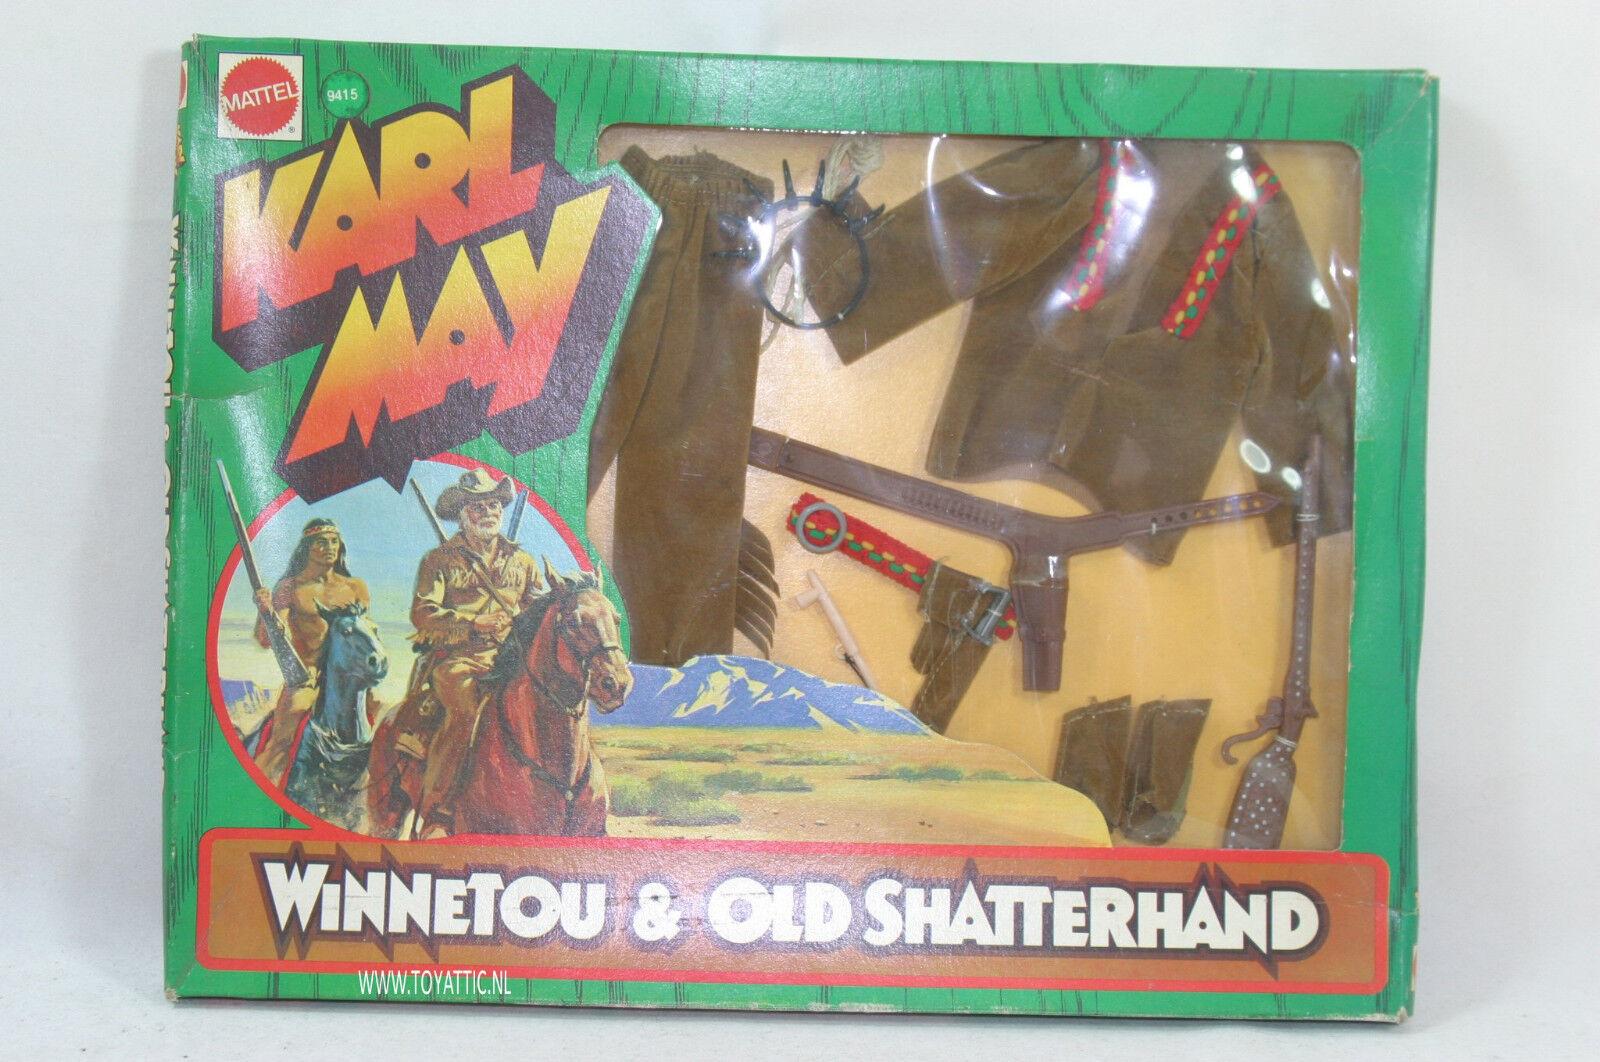 Big Jim storlek Karl May Winenetou mode från 1975 av Mattel NRFB (2)